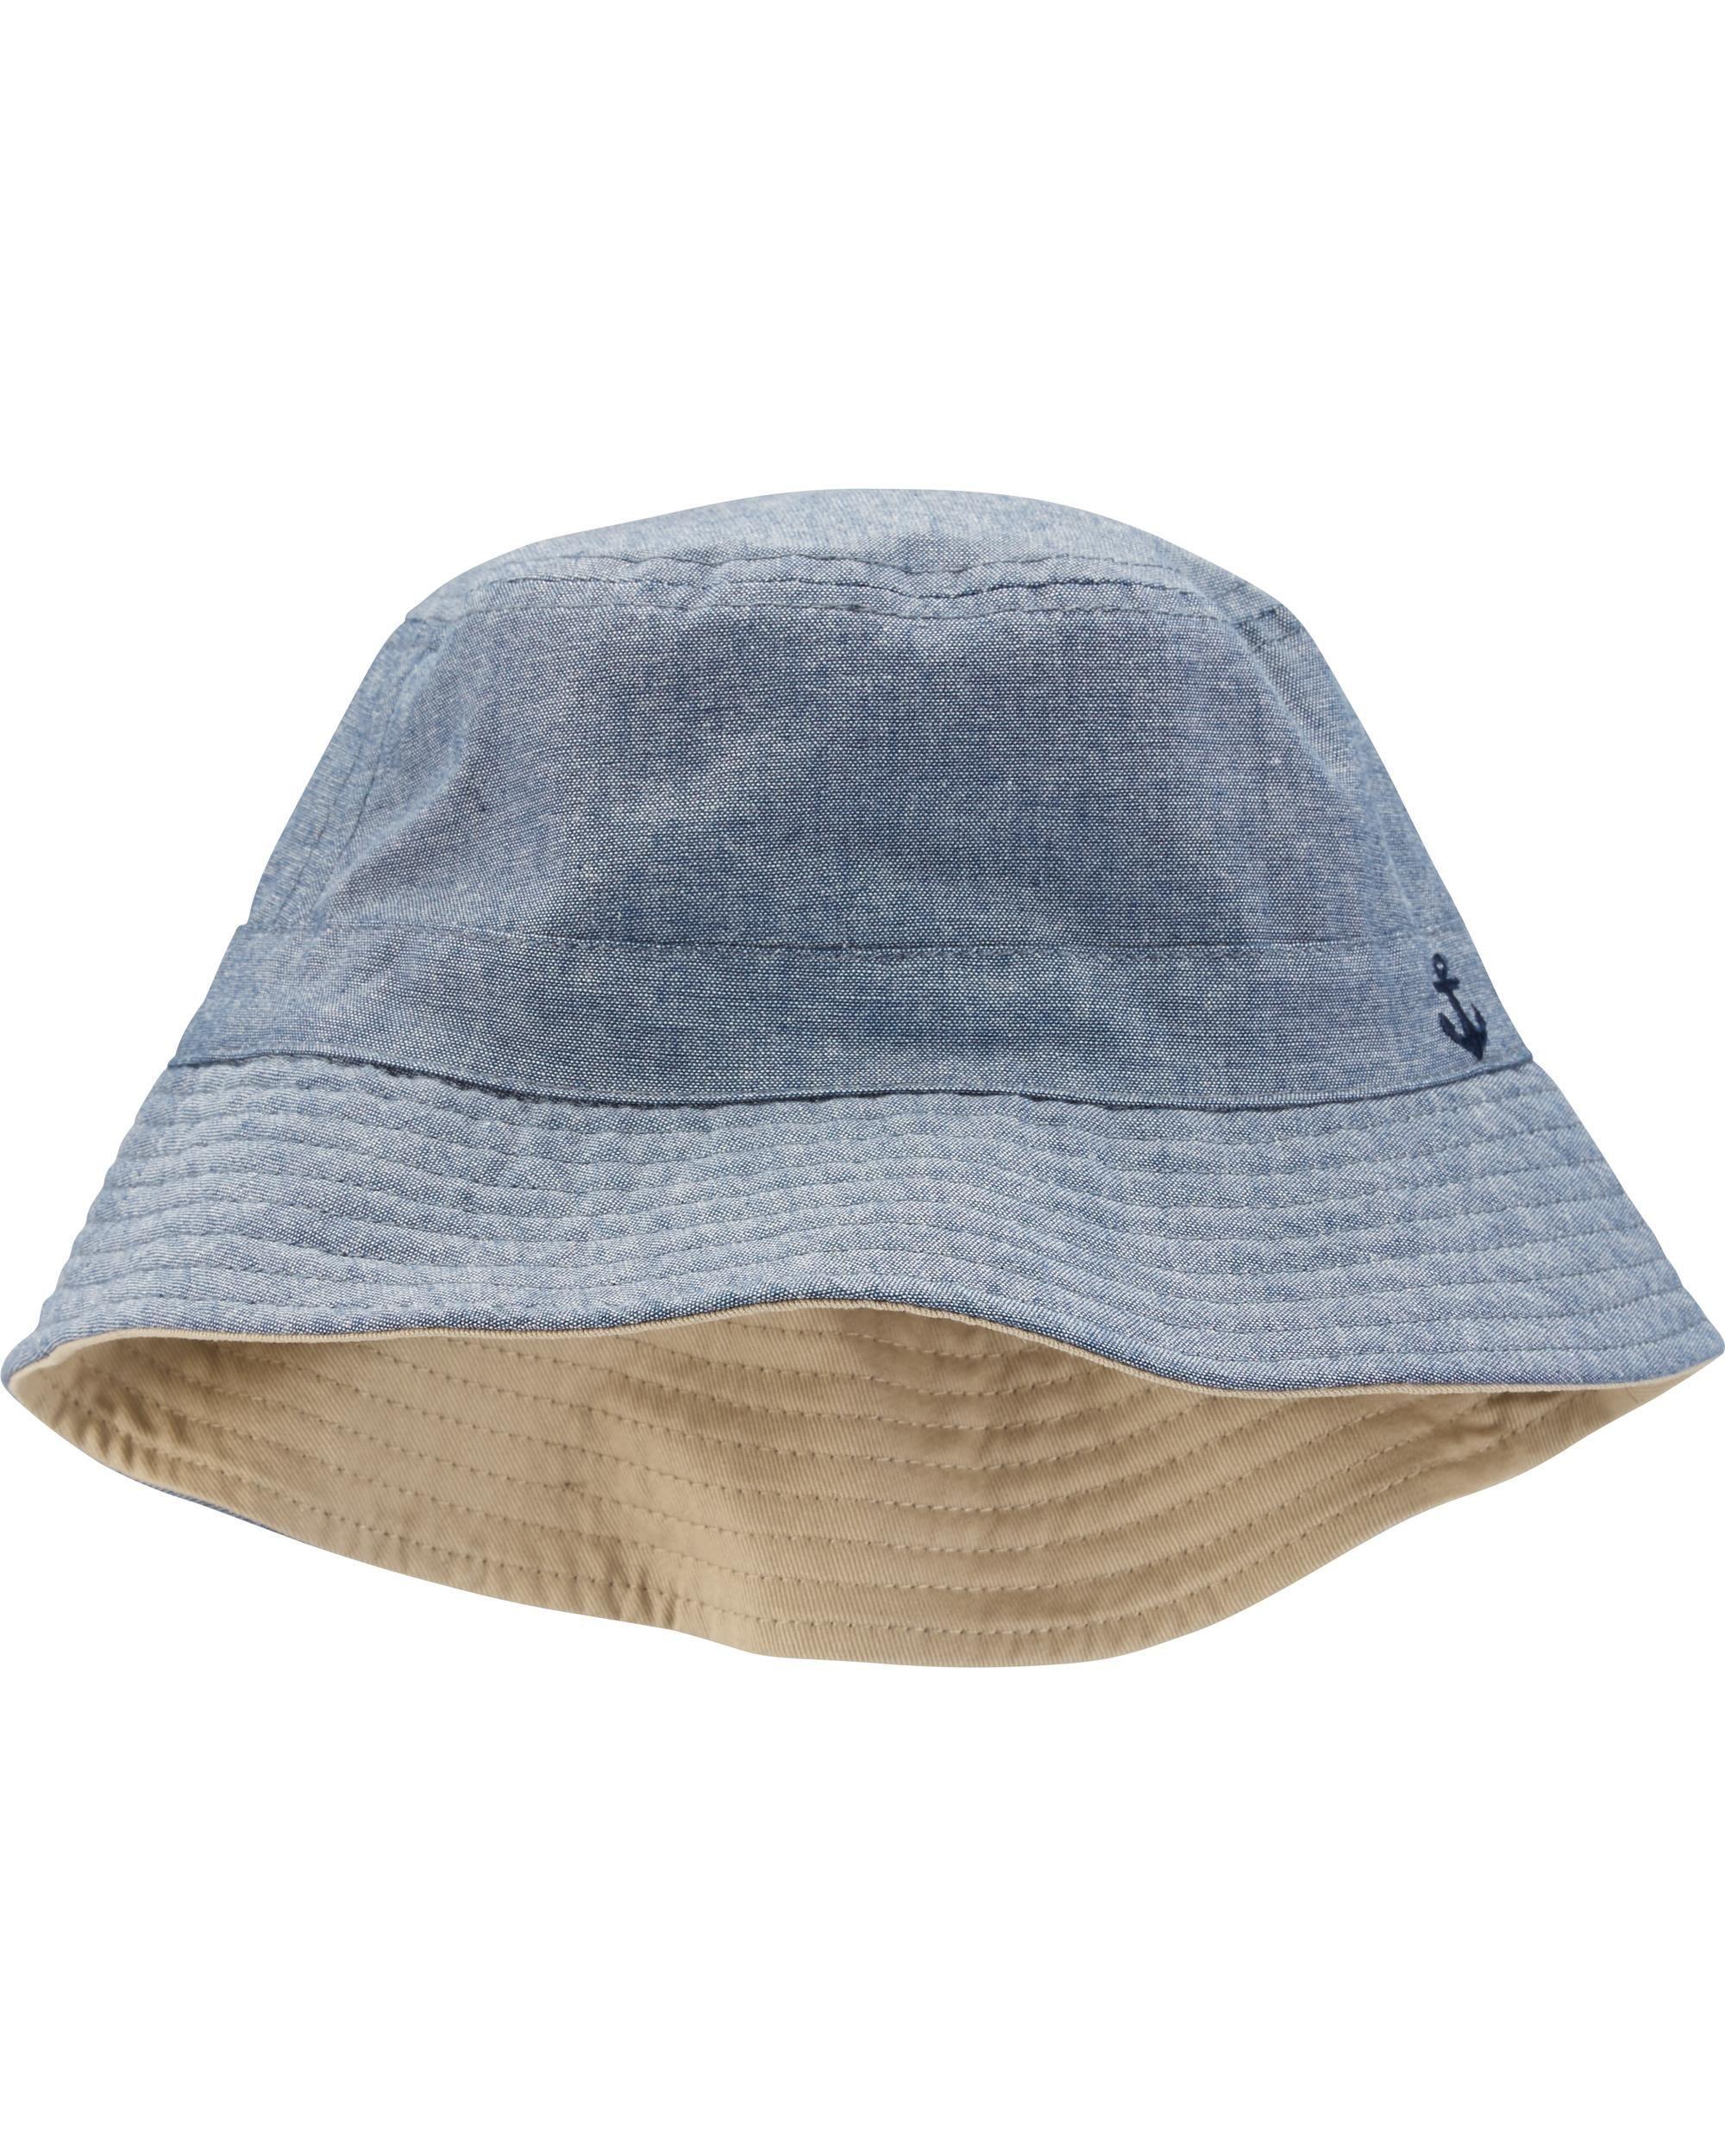 c019661fcb2 Toddler Boy Reversible Bucket Hat